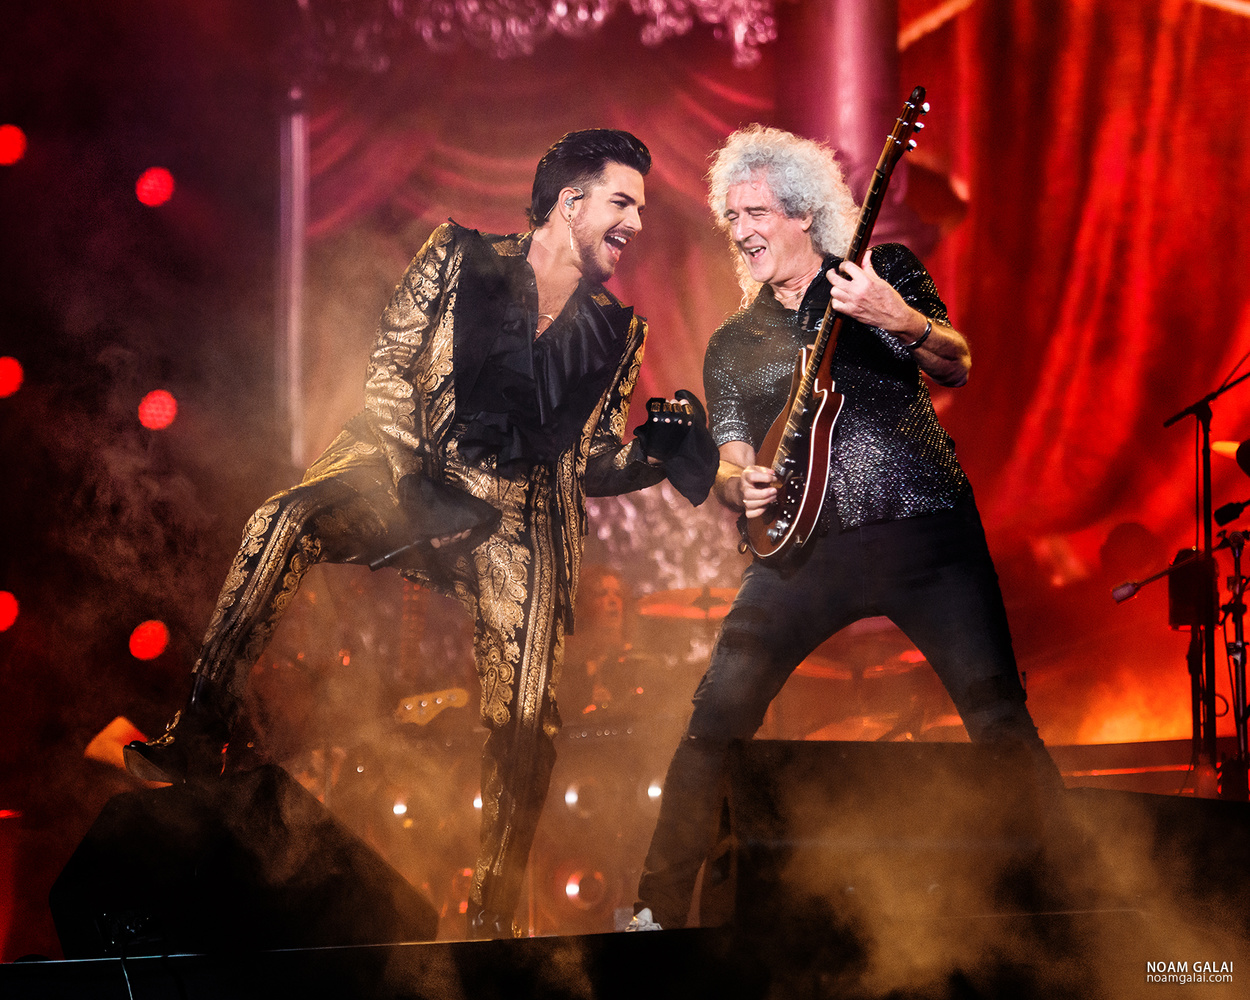 Queen: Brian May and Adam Lambert by Noam Galai